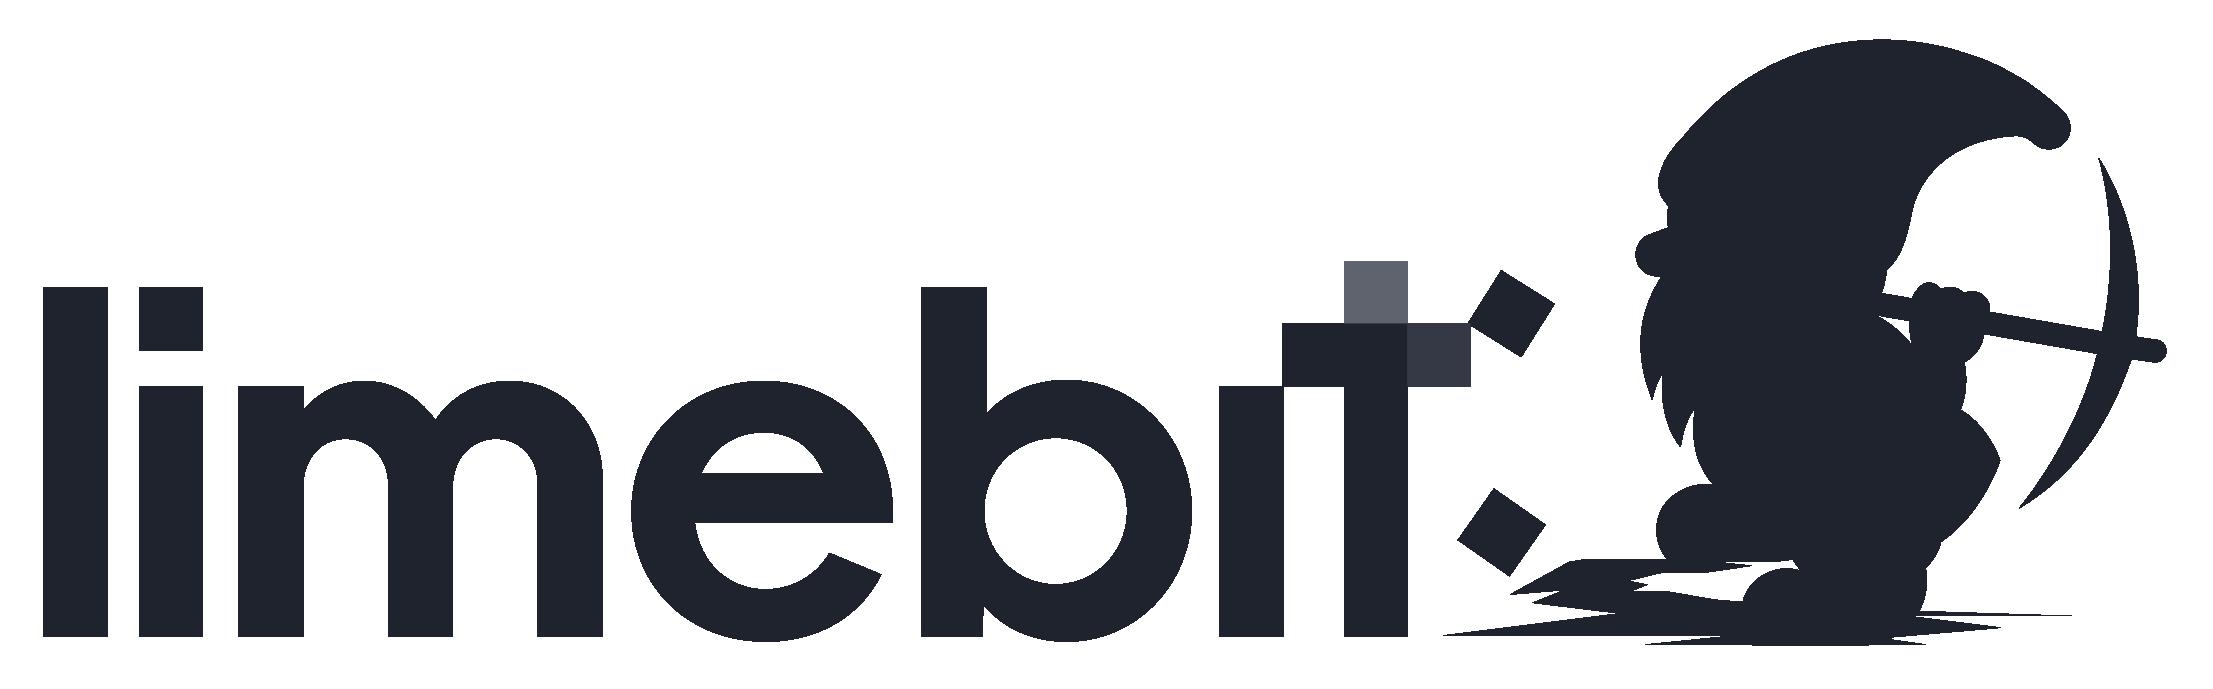 Limebit Logo - Zwerg mit Spitzhacke vor dem Schriftzug limebit